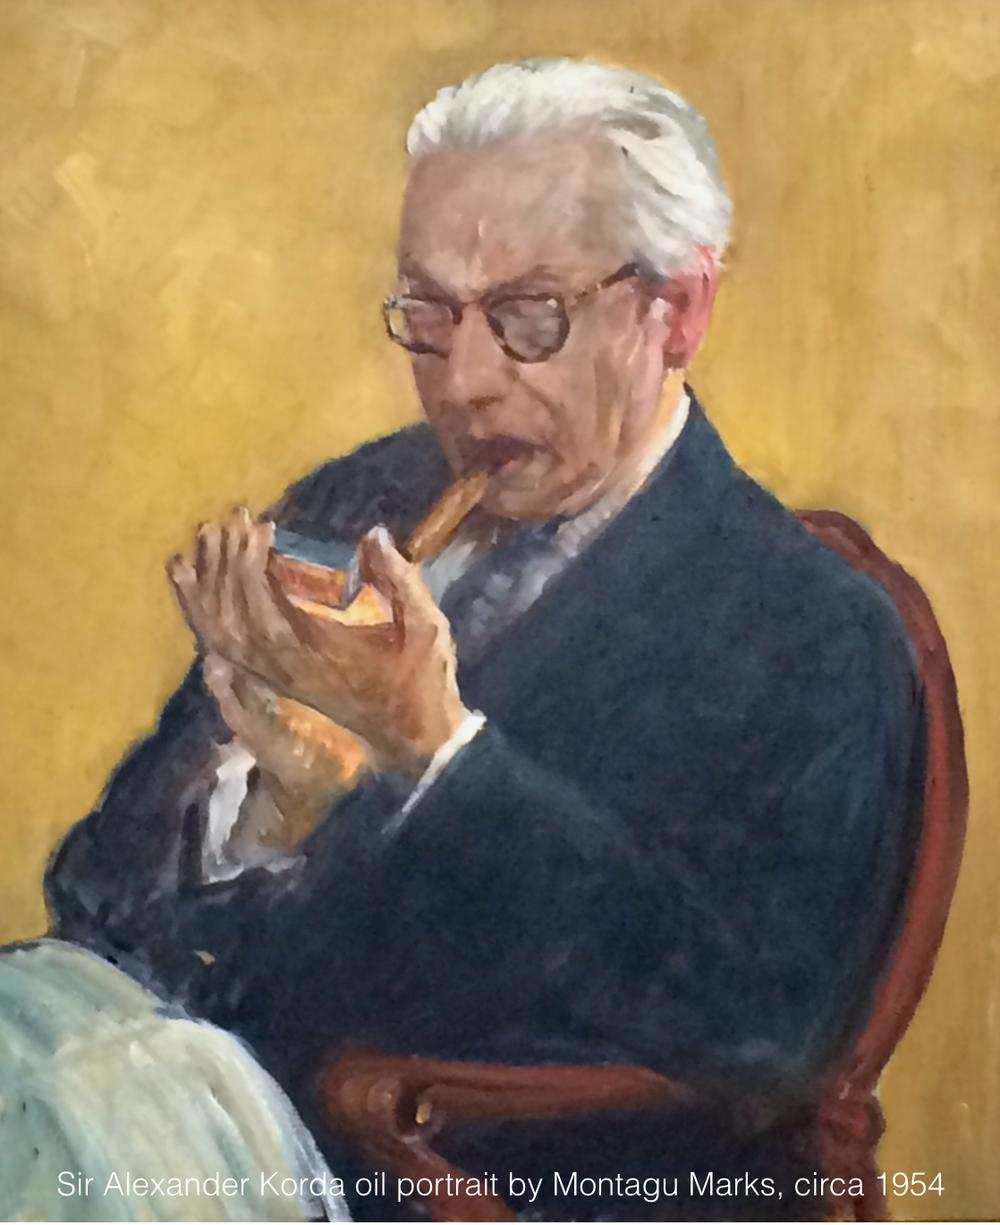 Alexander Korda portrait by Montagu Marks, circa 1954. Copyright Montagu Marks' Estate All Rights Reserved.